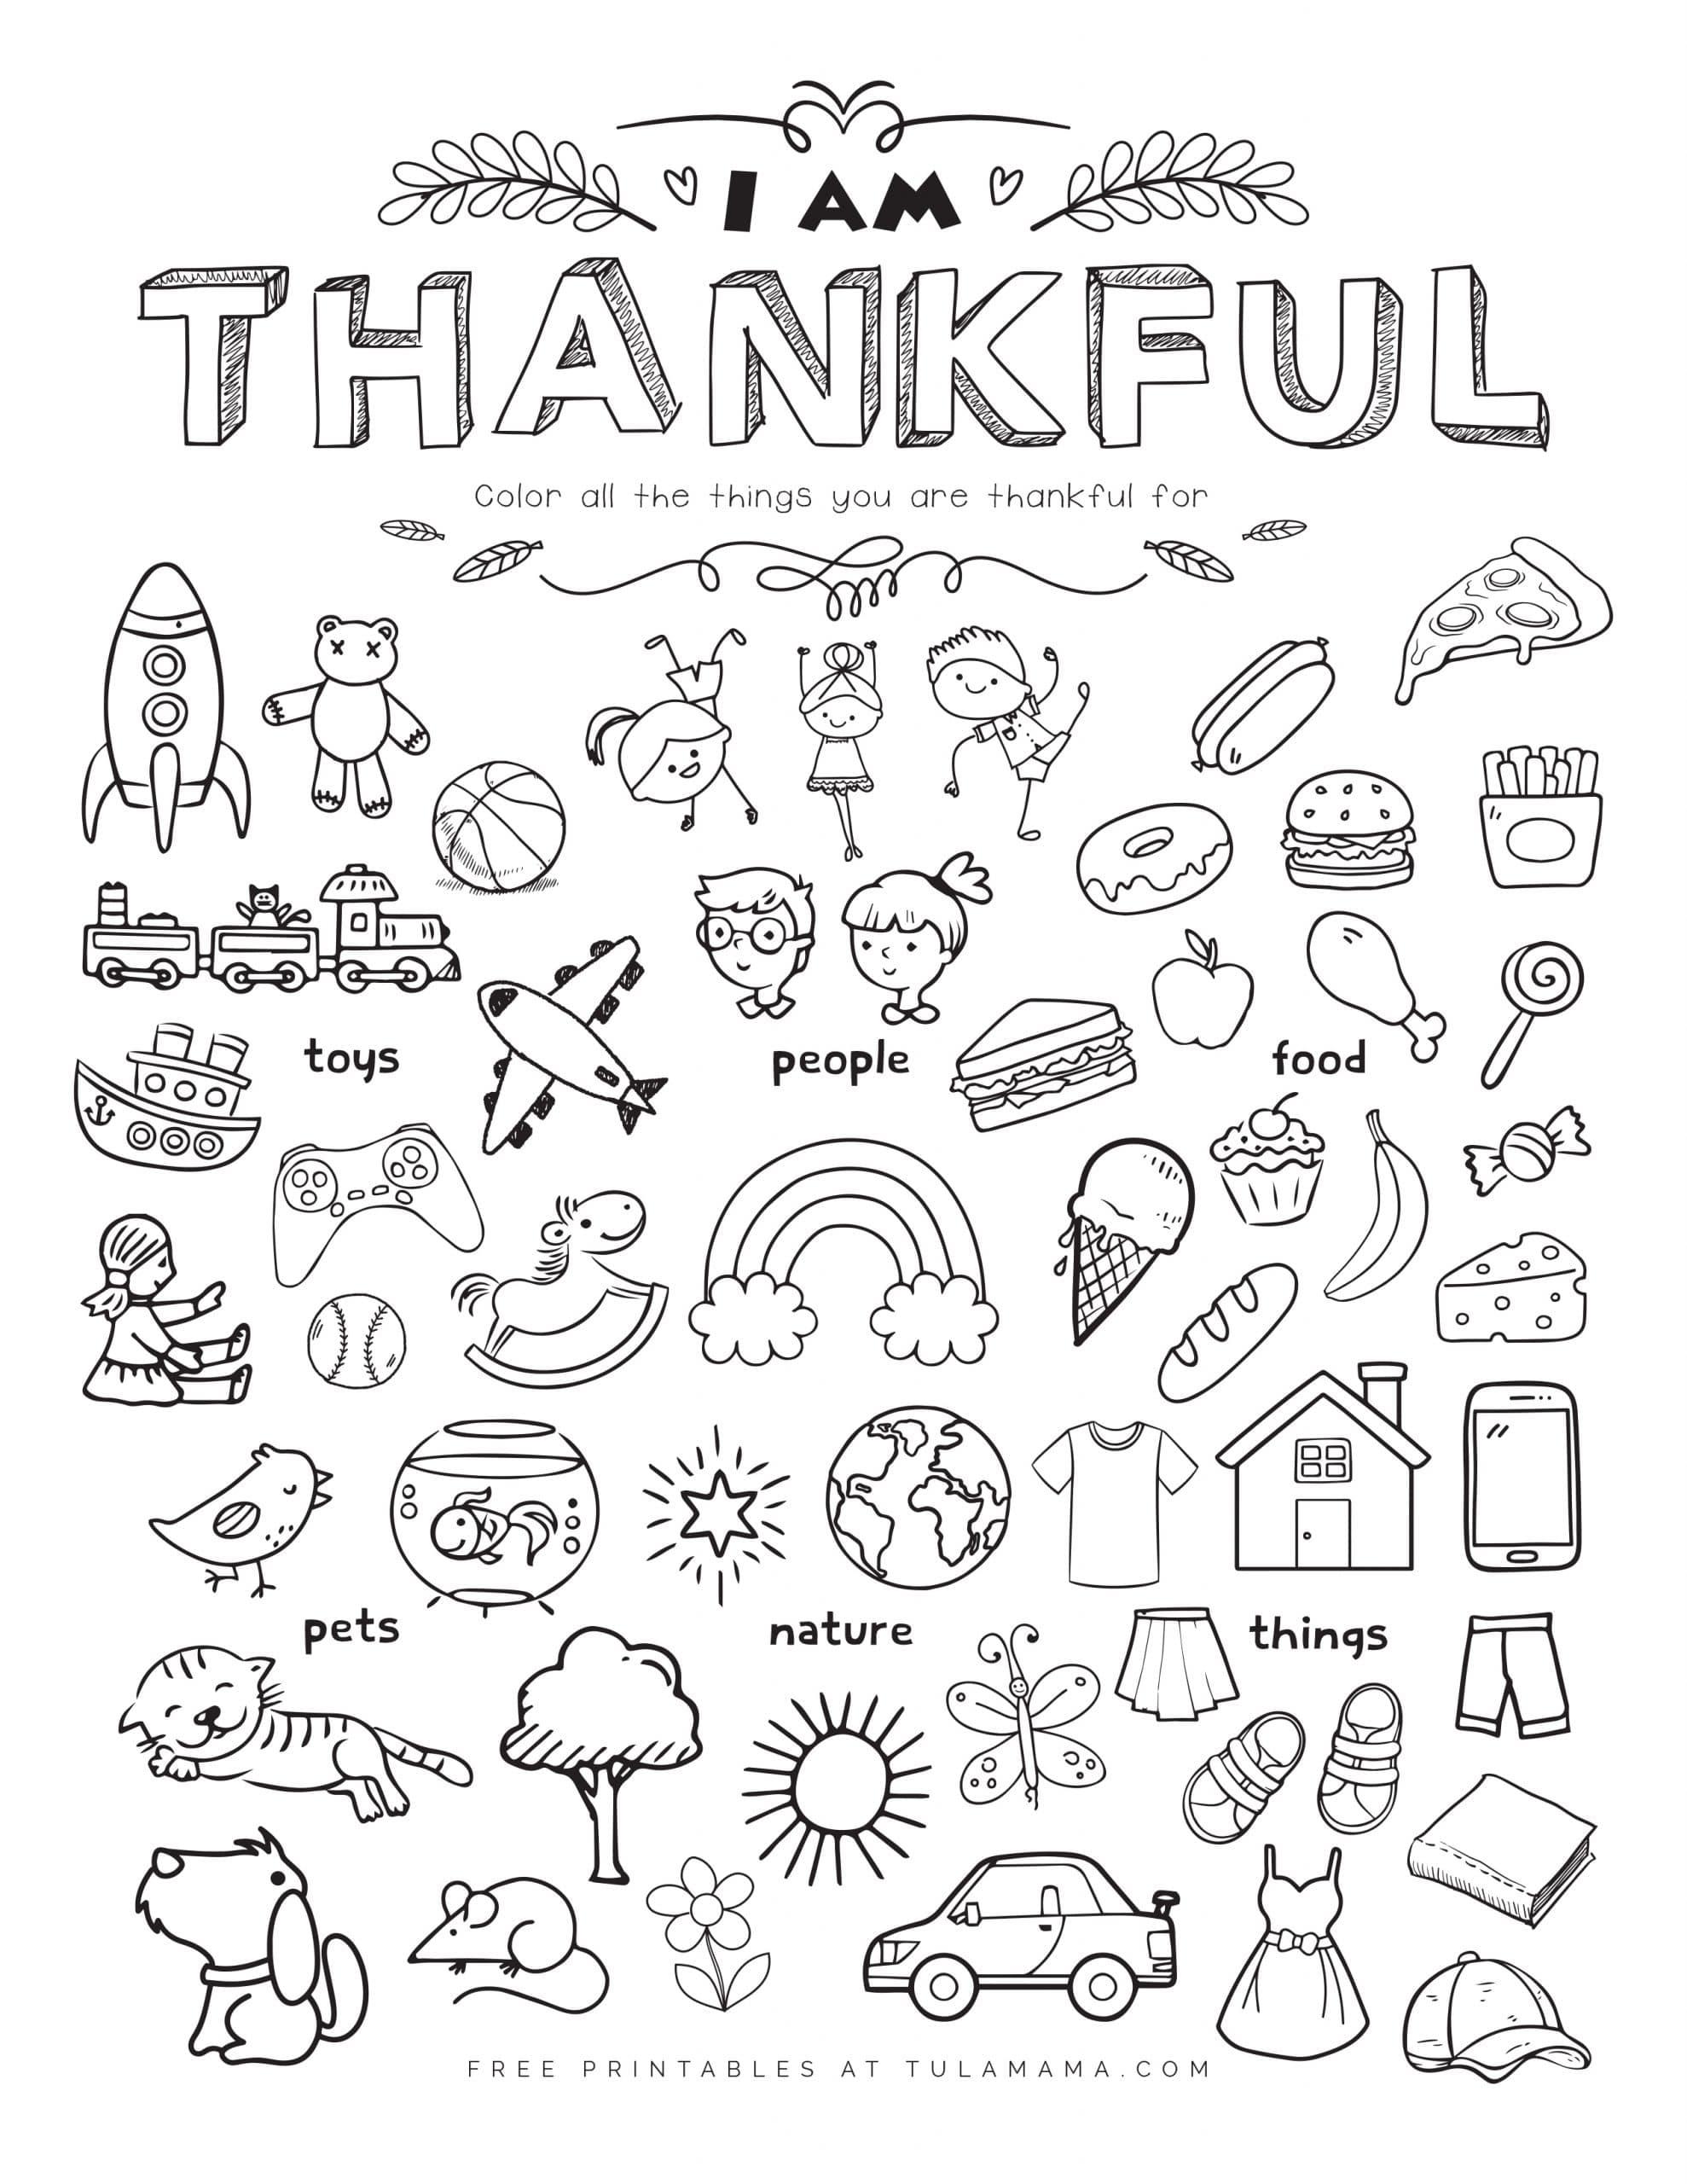 Free I am thankful for worksheet printables